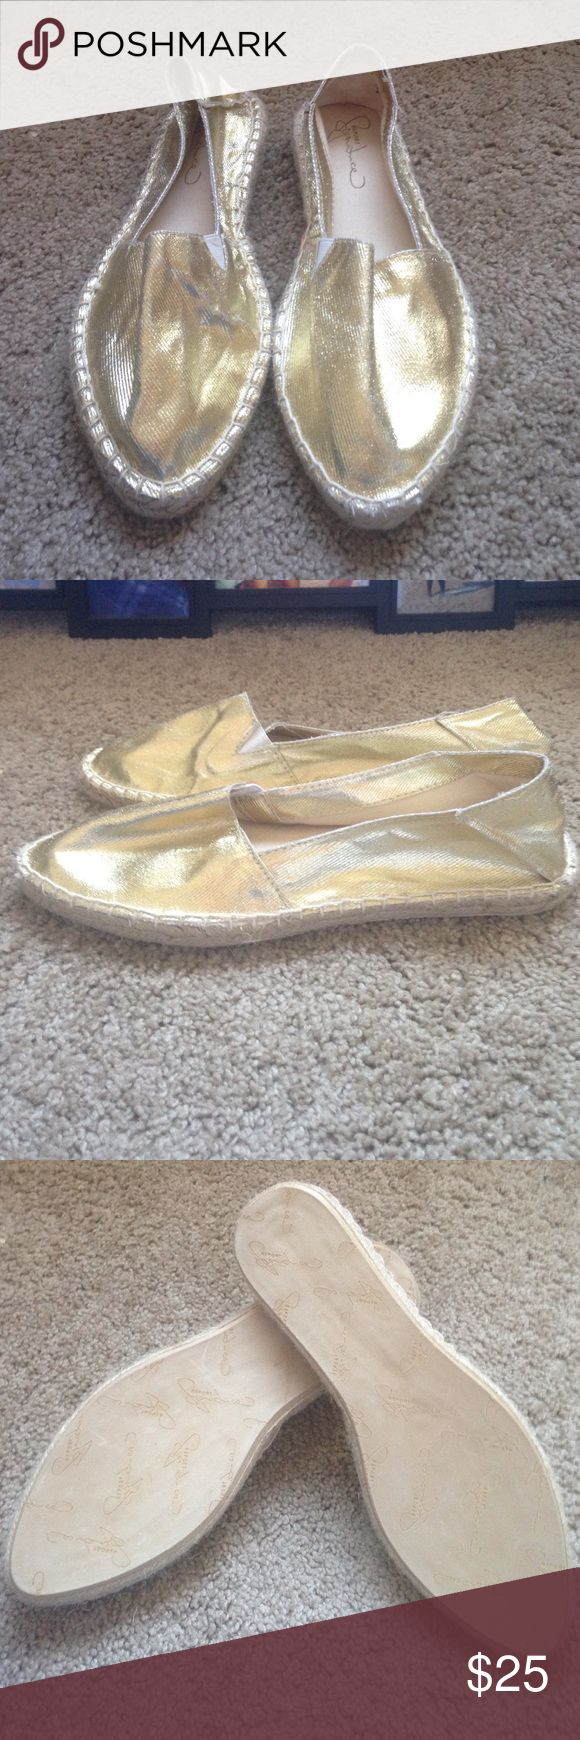 Report Signature Gold Espadrilles Brand new. Super cute gold metallic. Perfect for summer. Size 9. Report Signature Shoes Espadrilles